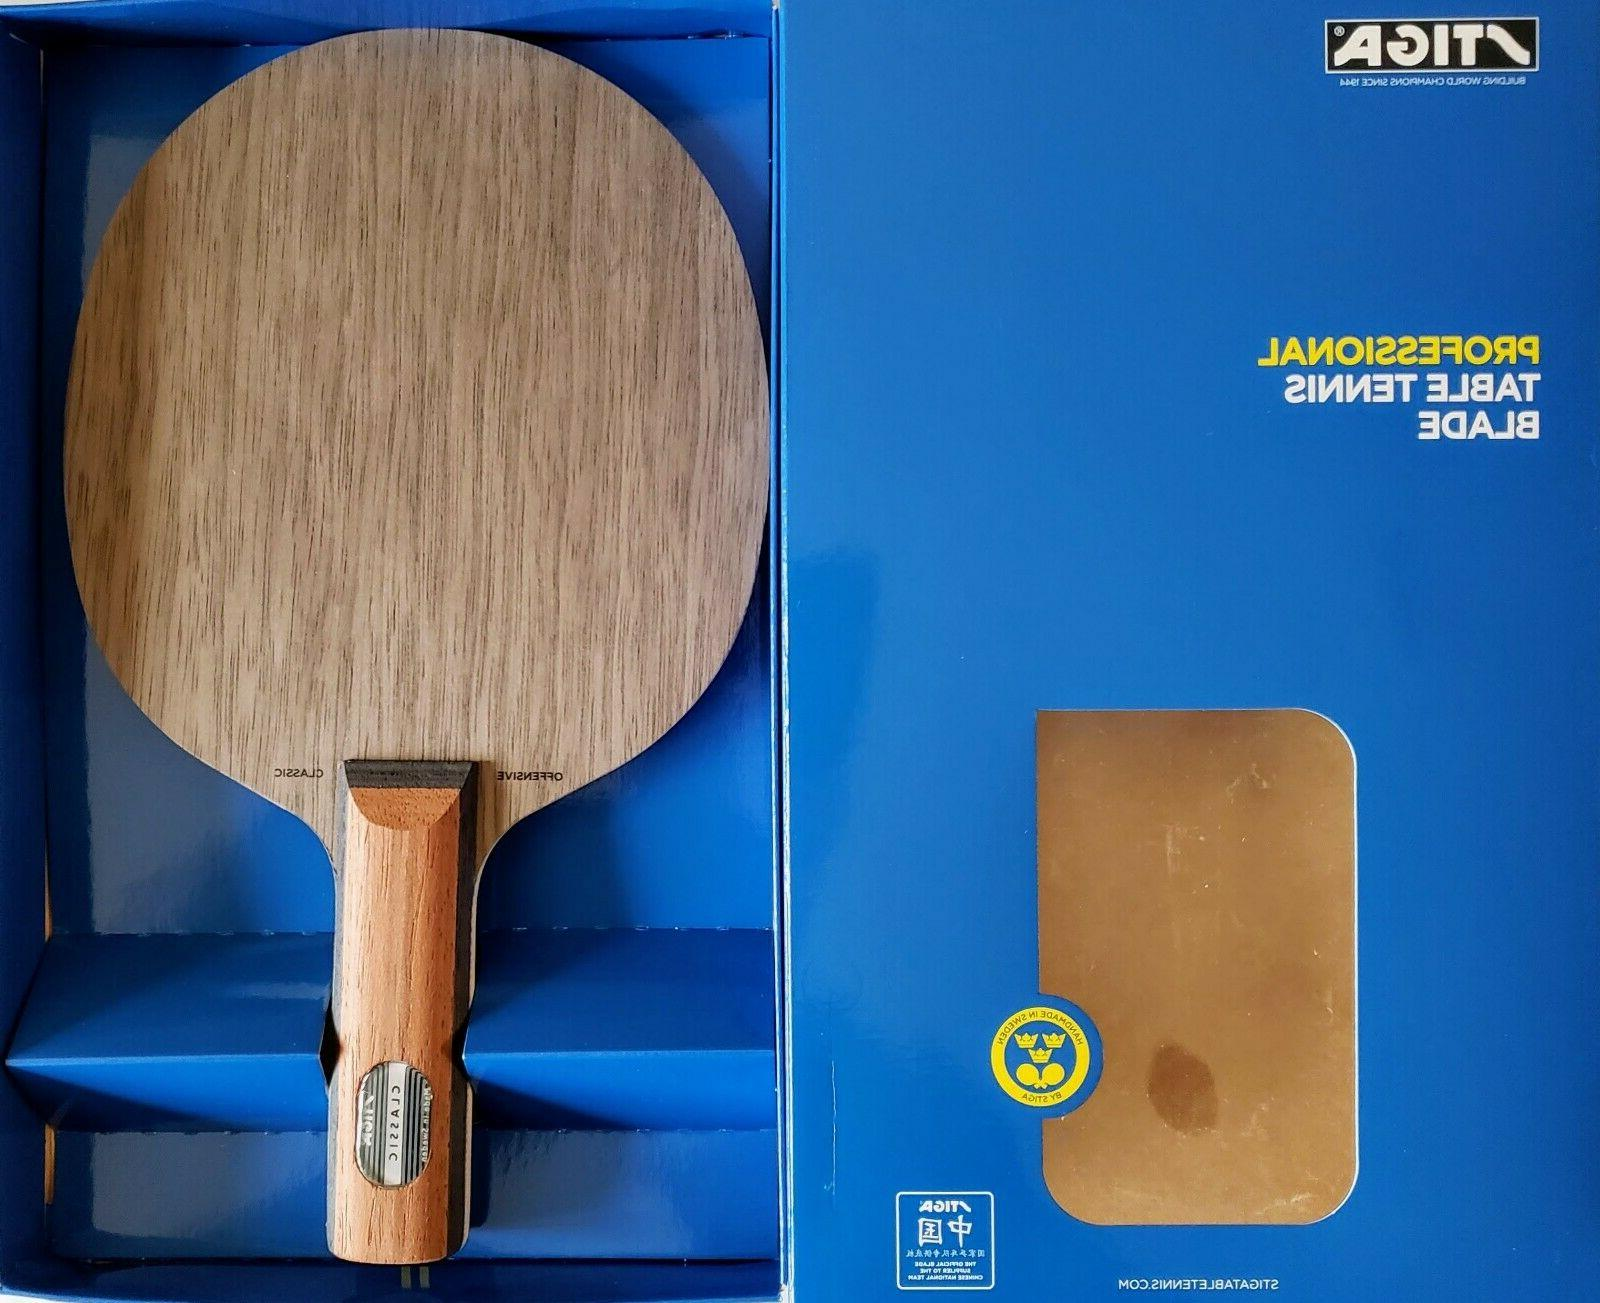 Stiga Offensive Table Tennis